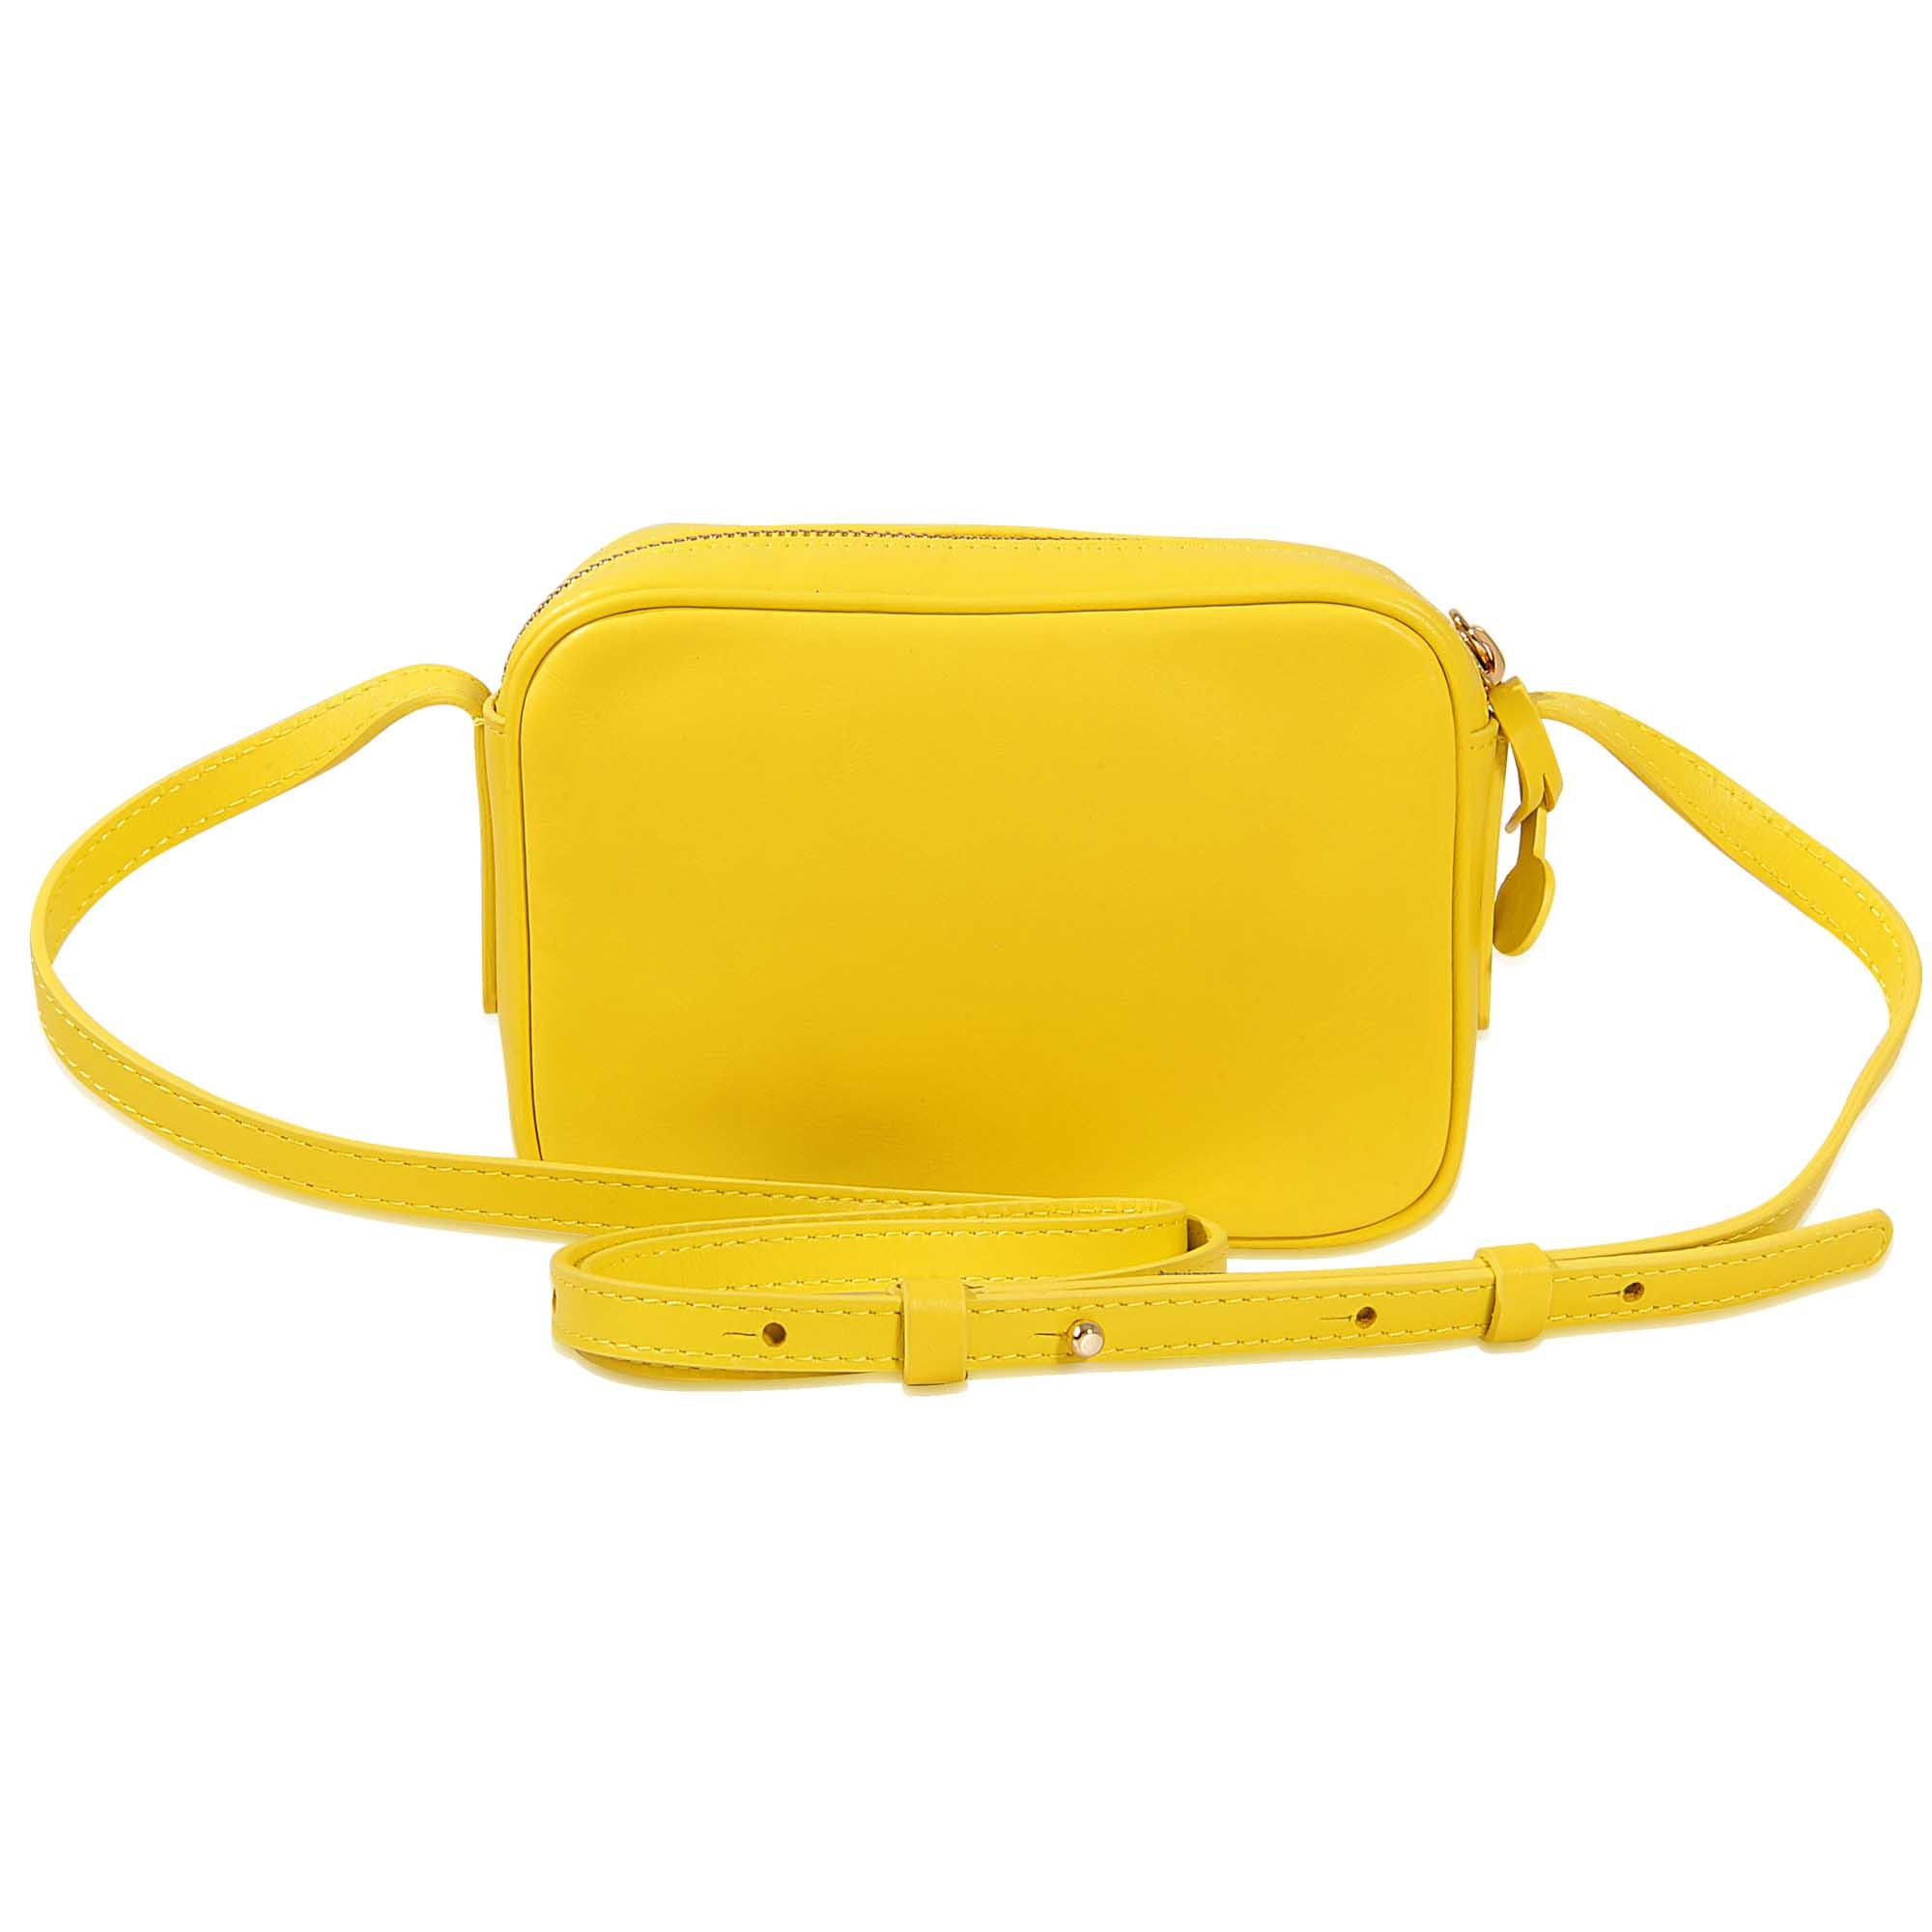 Adage Small Camera Bag Repetto OQOR0U